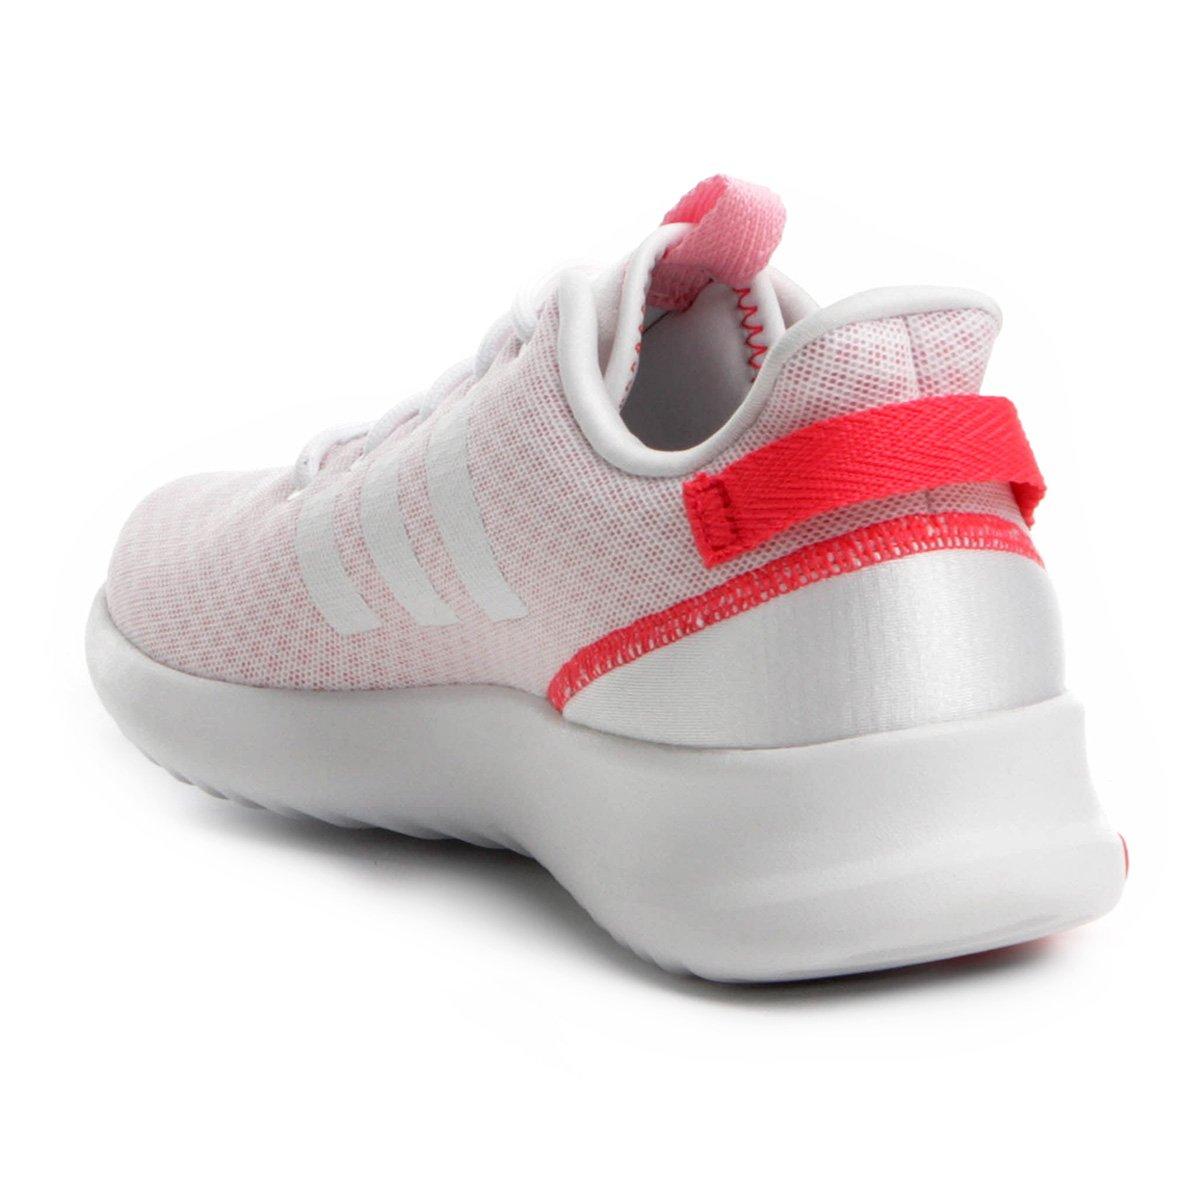 Cf Feminino Tênis Tênis Tr W Pink Racer Cf Adidas Adidas Racer W Tr qBw10BA